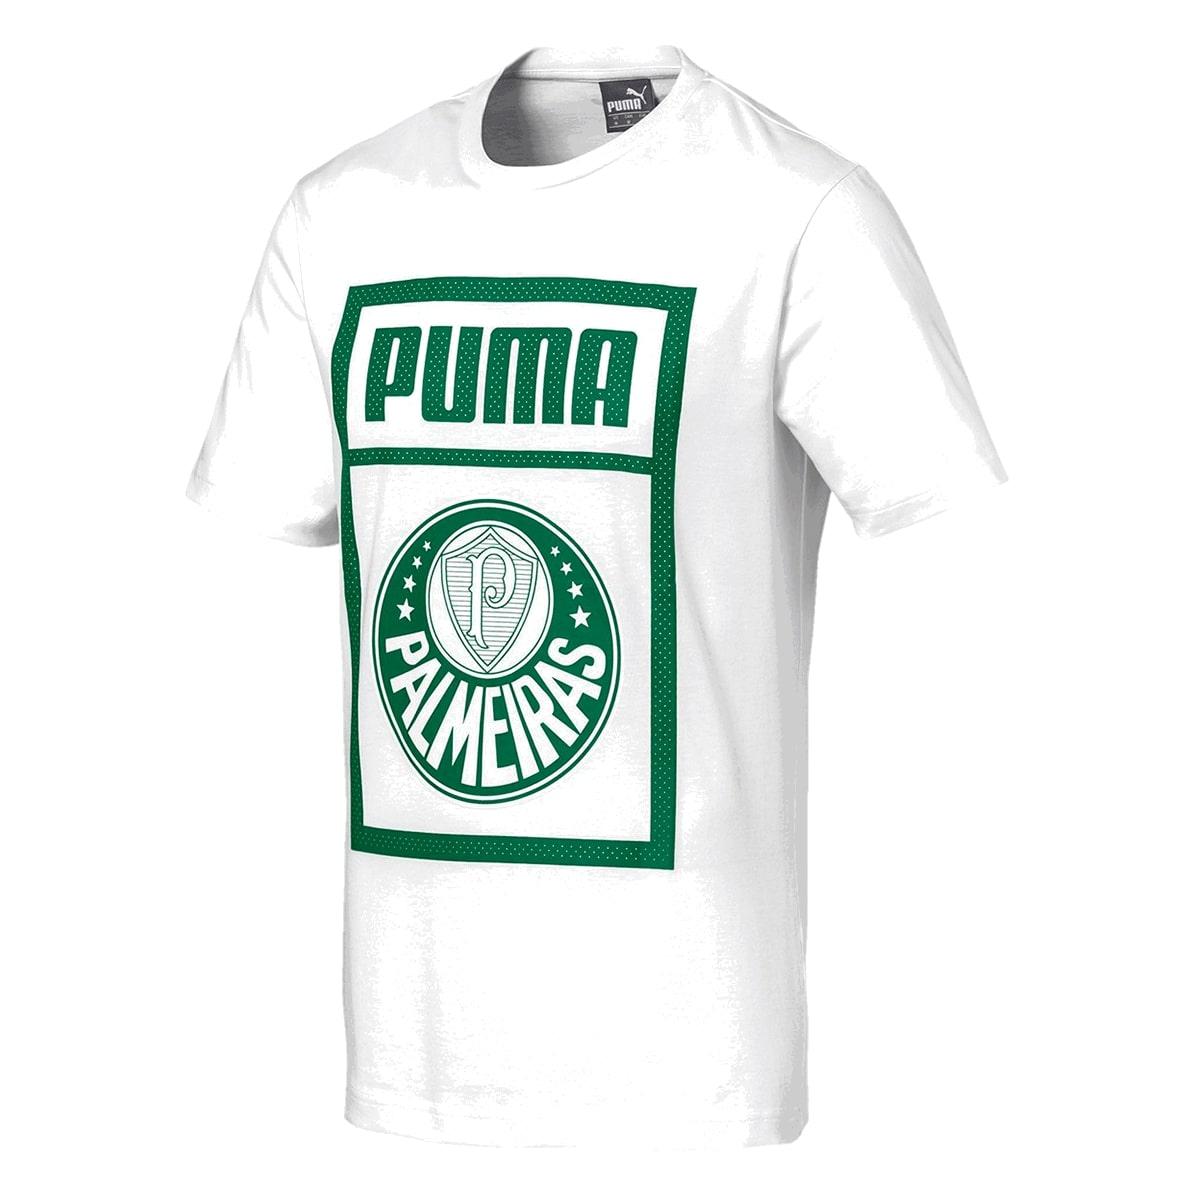 Camiseta Palmeiras Puma Graphic Masculino Branco